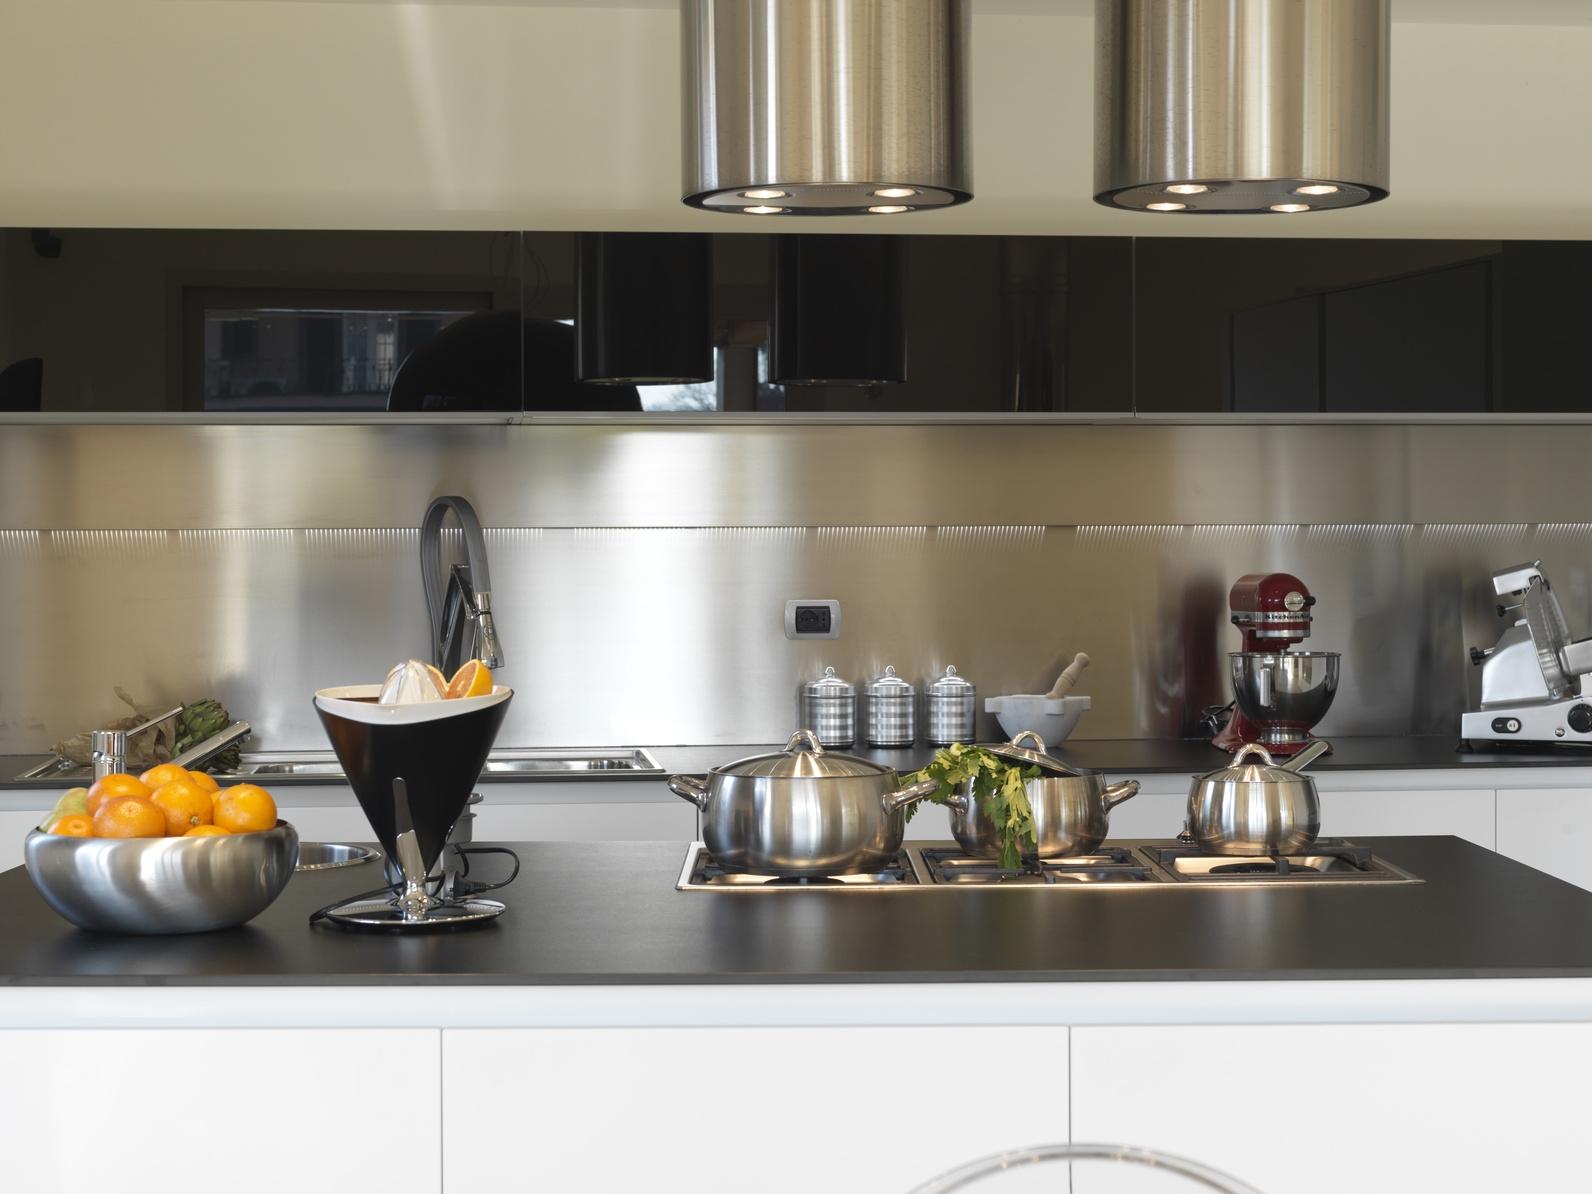 Credence cuisine peinture cr dences cuisine - Peinture brillante pour cuisine ...